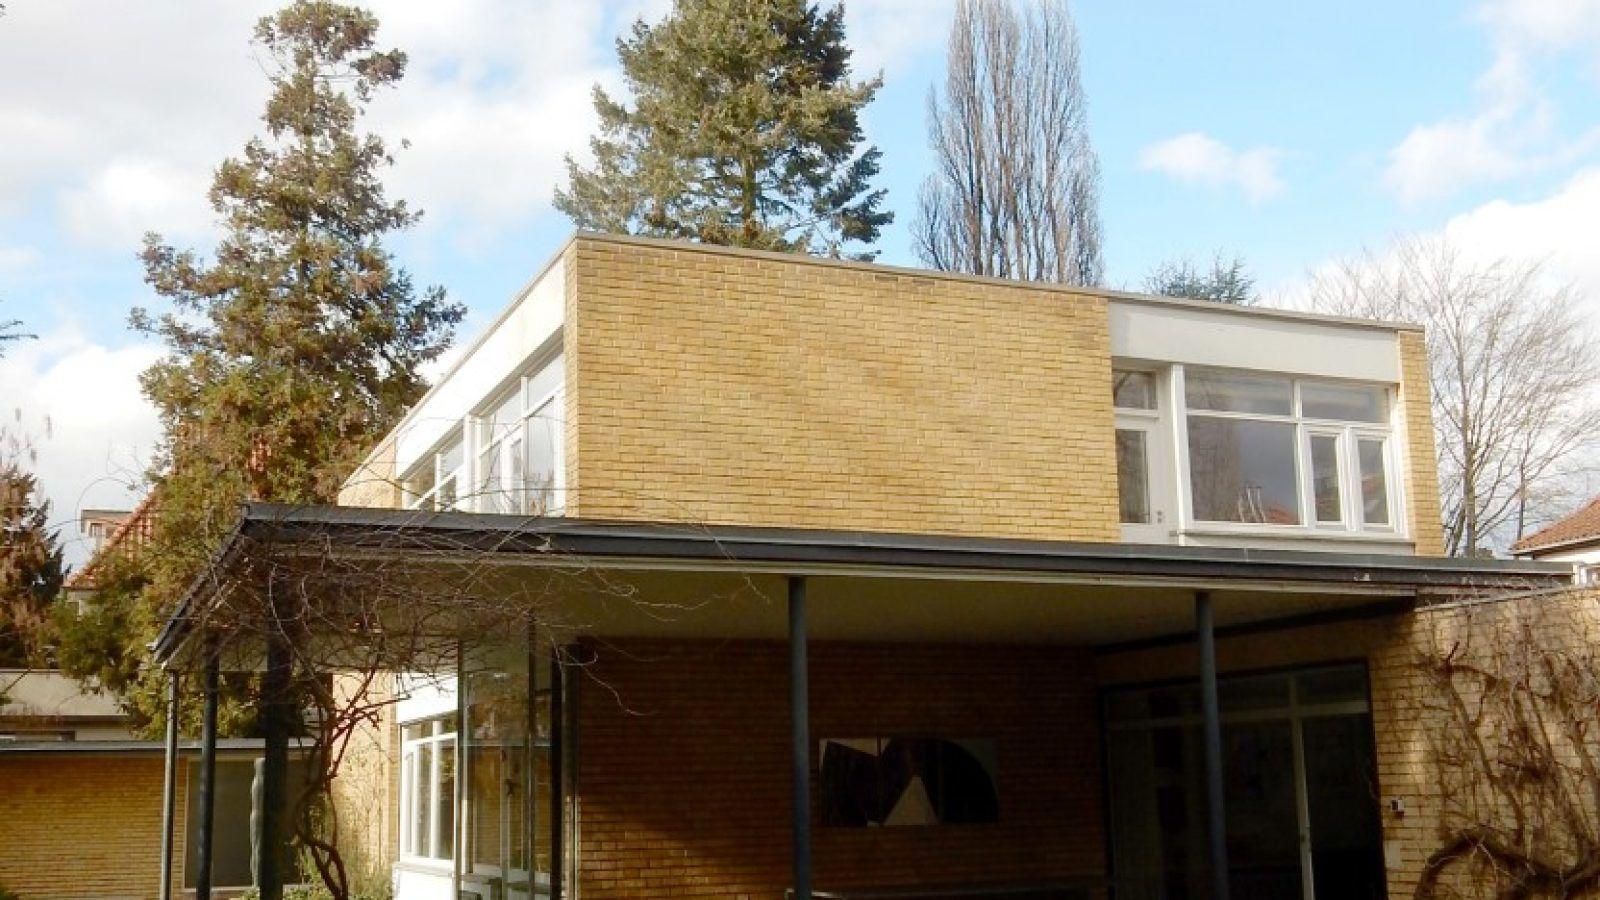 Foto: BDA Niedersachsen